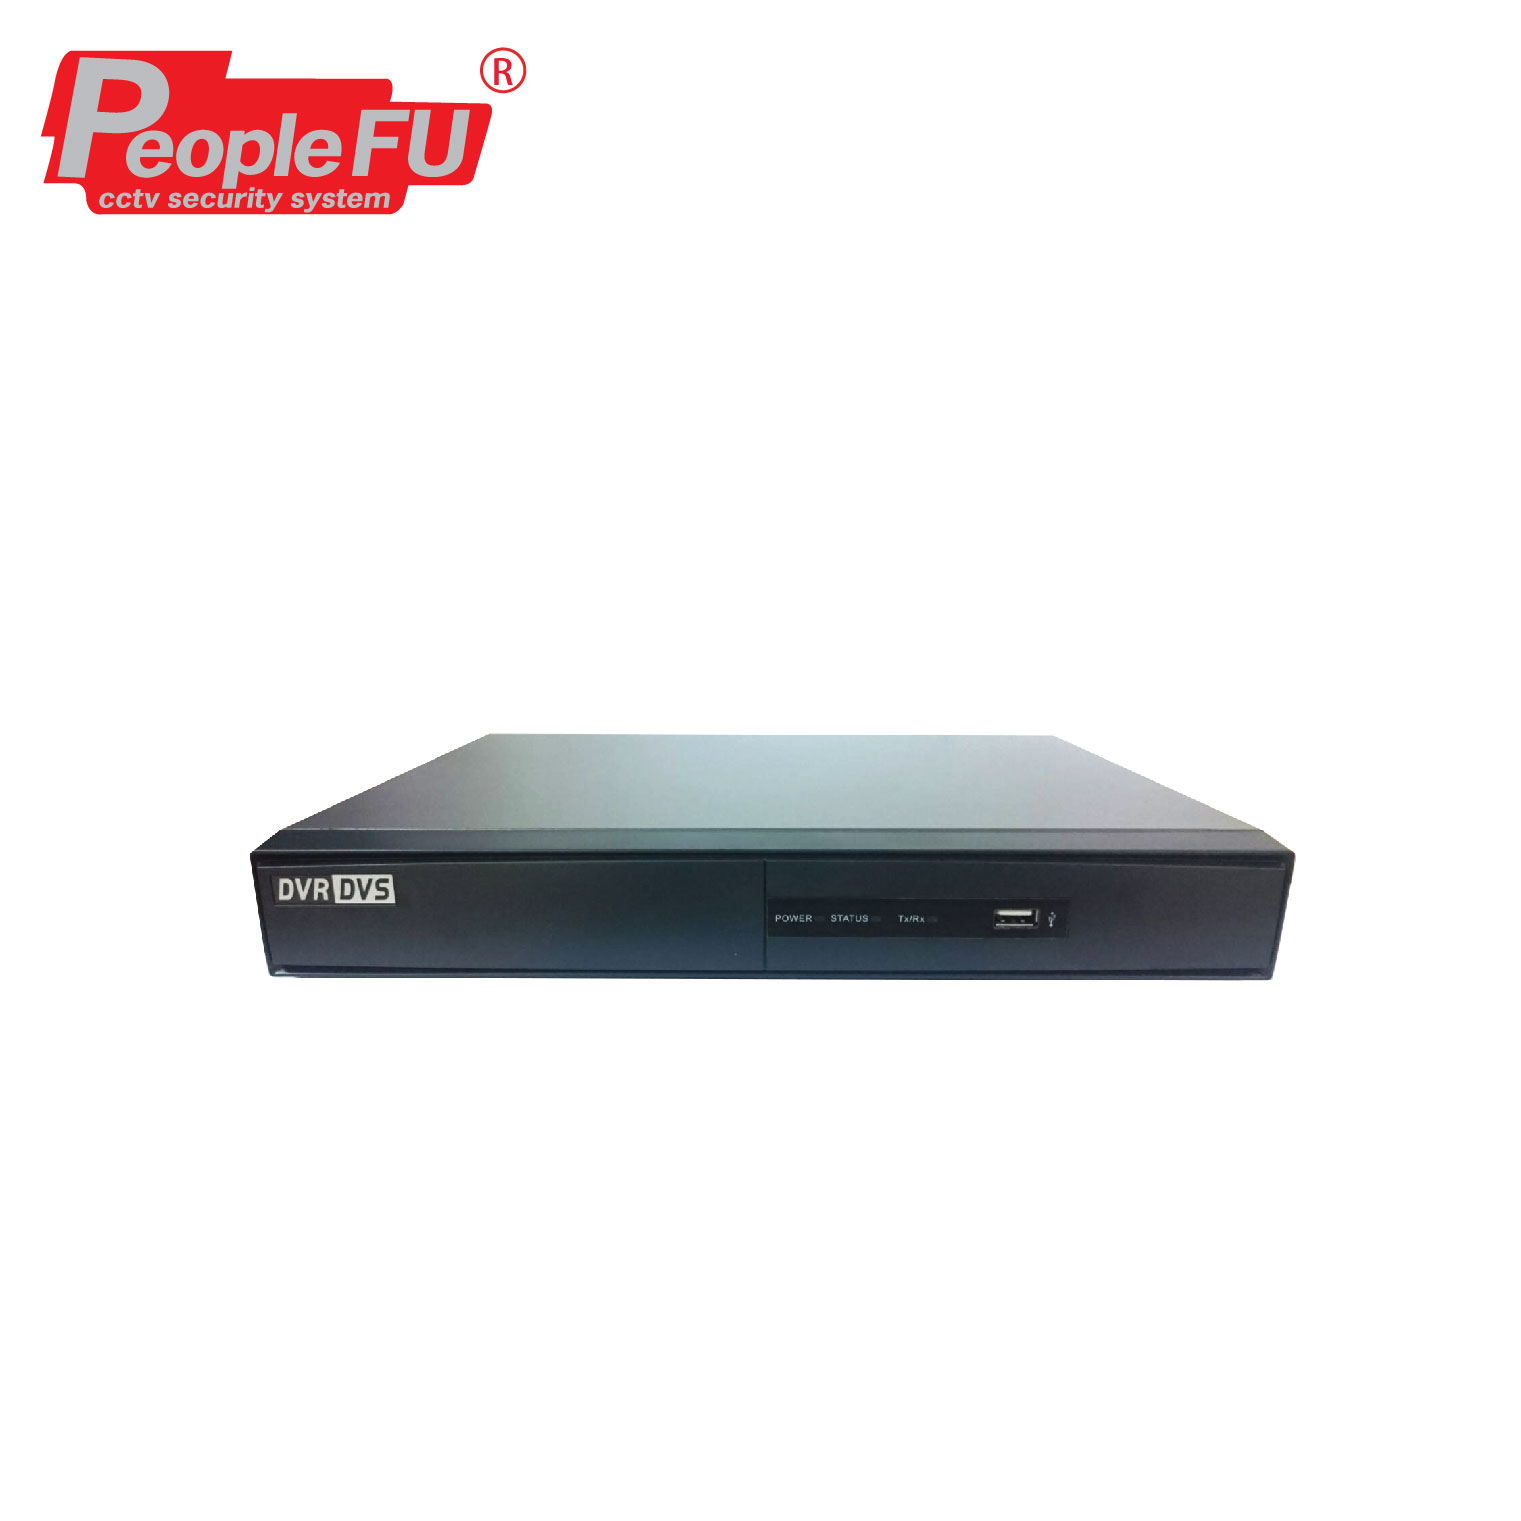 PeopleFu HDTVI 8008F1-S2 8CH ขายดี ภาพชัดสุดๆ